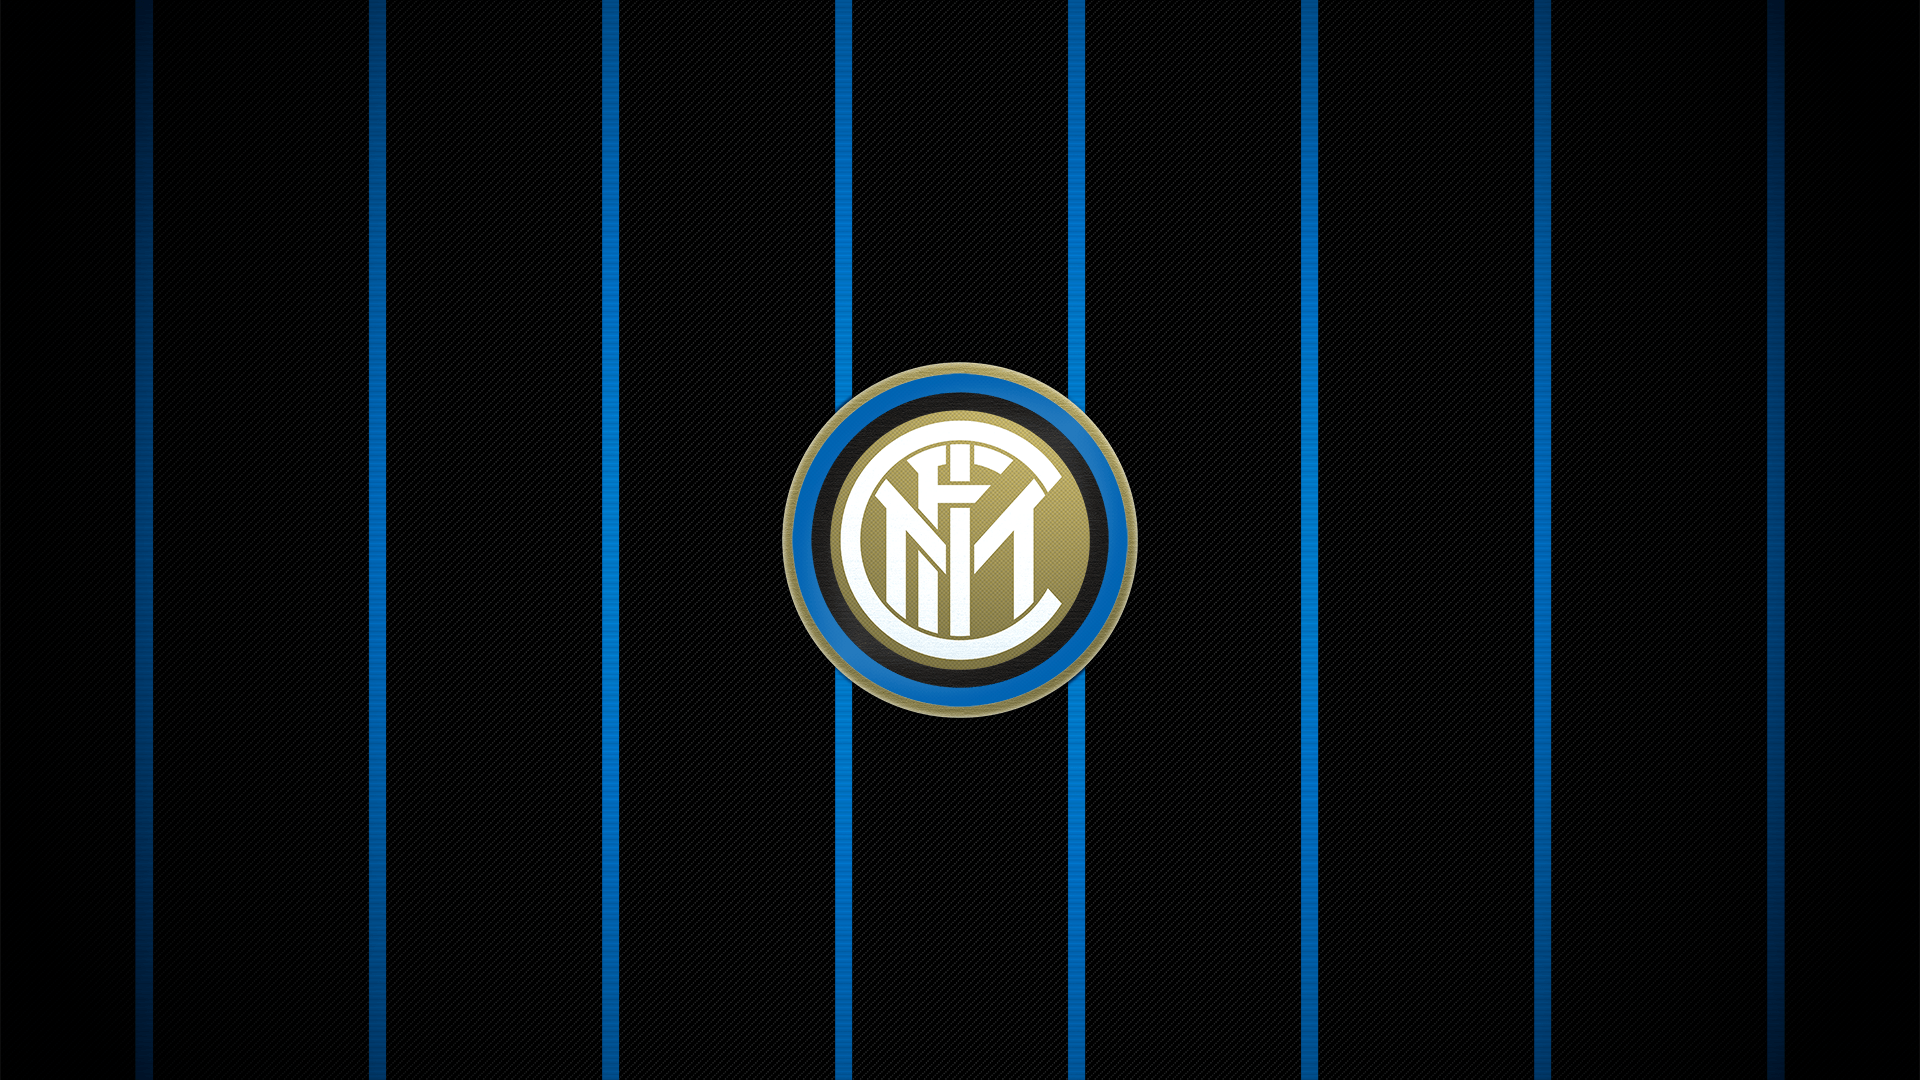 Inter Milan Teams Background